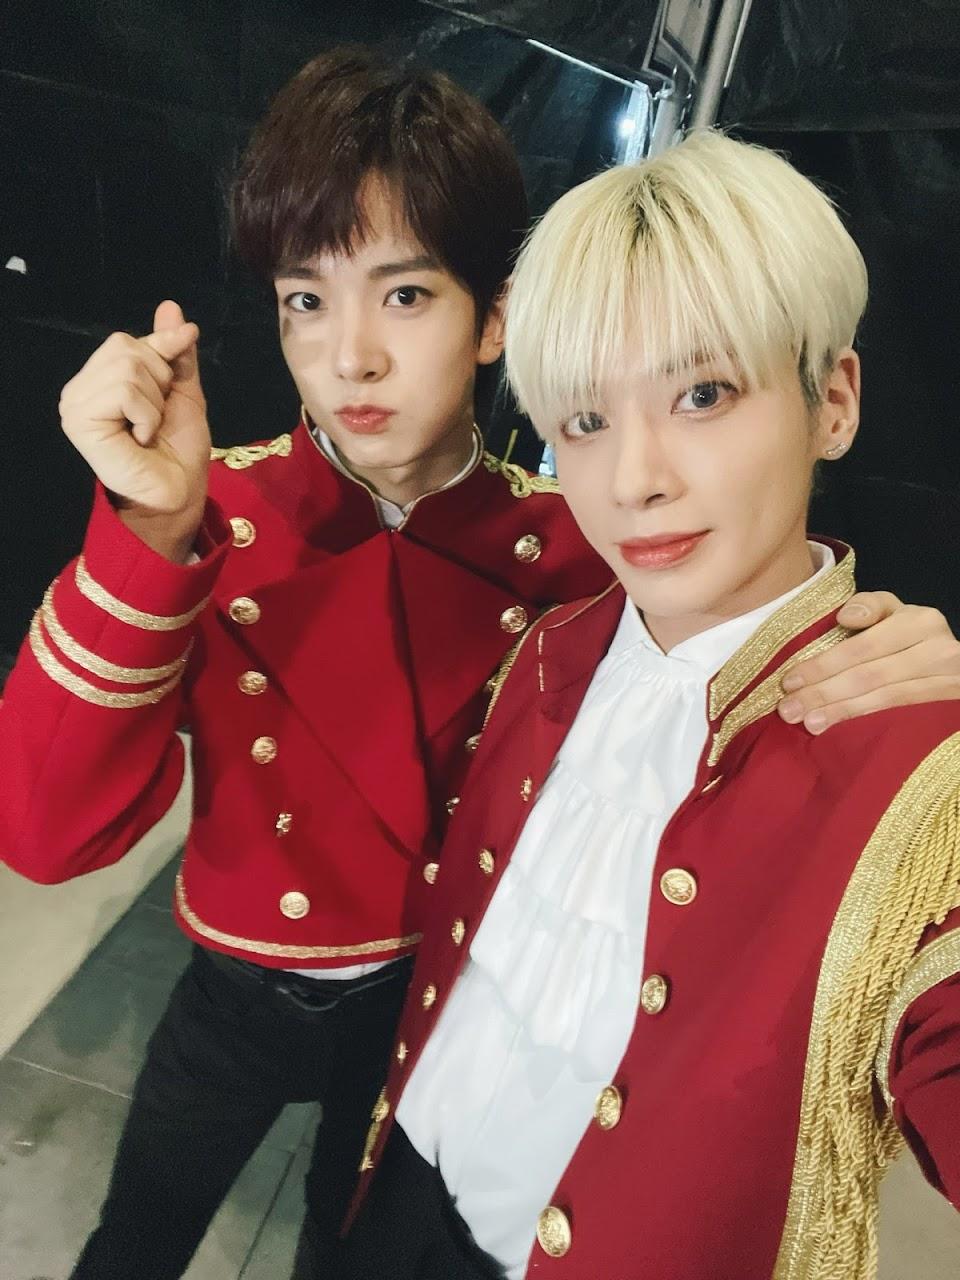 txt taehyun enhypen heeseung @ENHYPEN_members 2